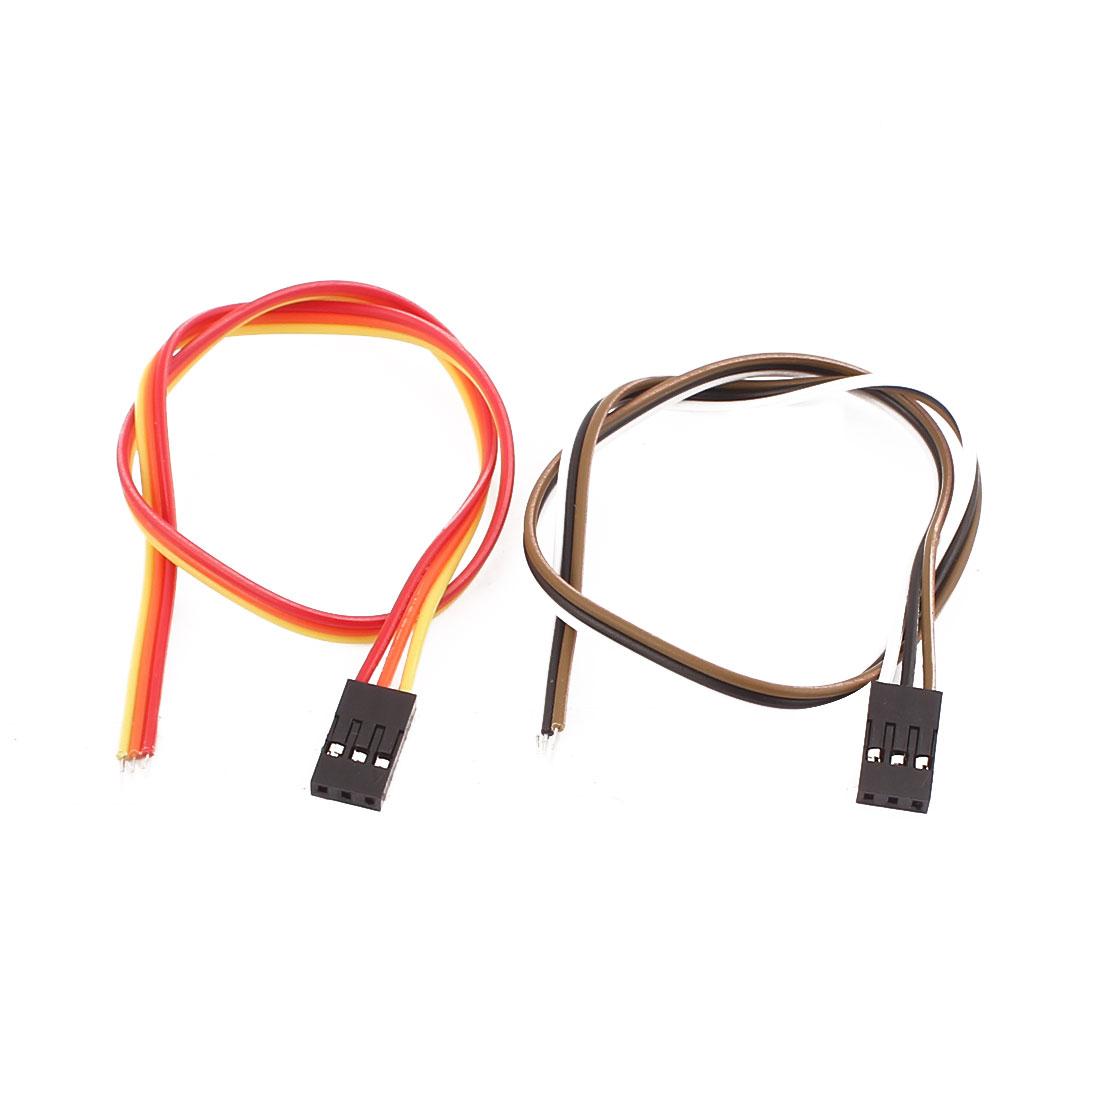 2 Pcs Female 3P Jumper Wires Ribbon Cables Pi Pic Breadboard DIY 30cm Long